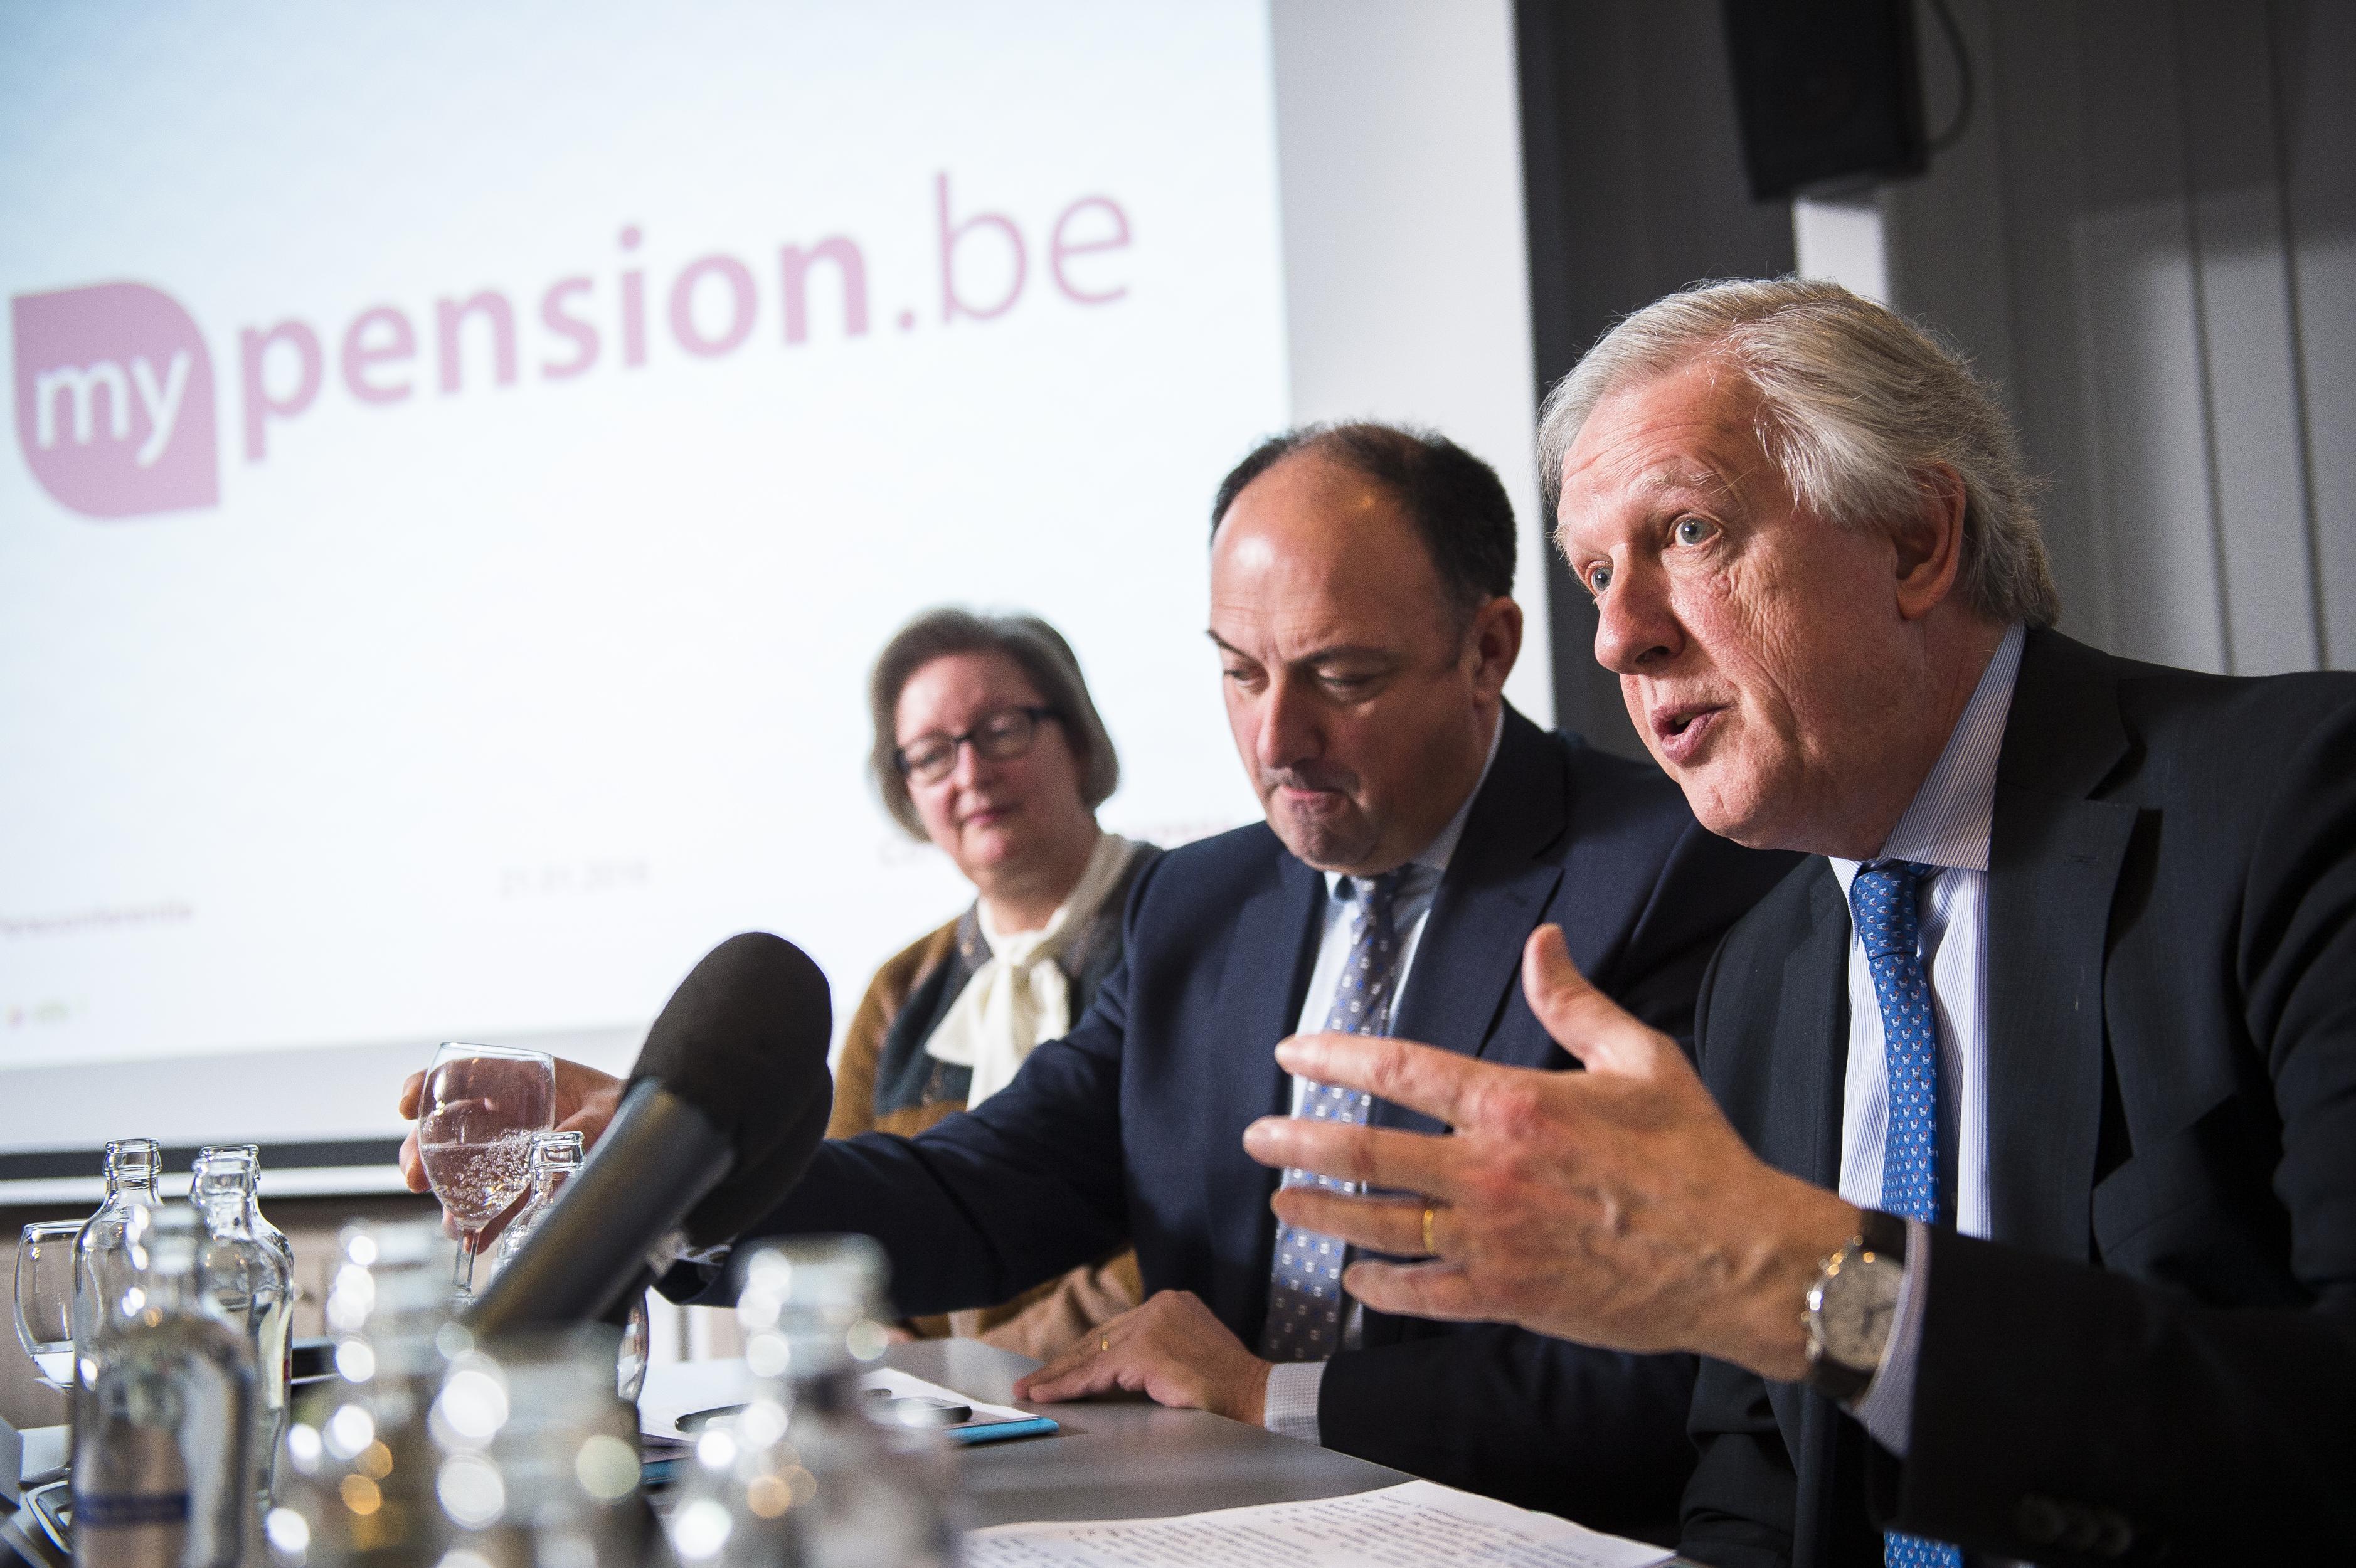 BELGIUM POLITICS PRESENTATION NEW WEBSITE MYPENSION